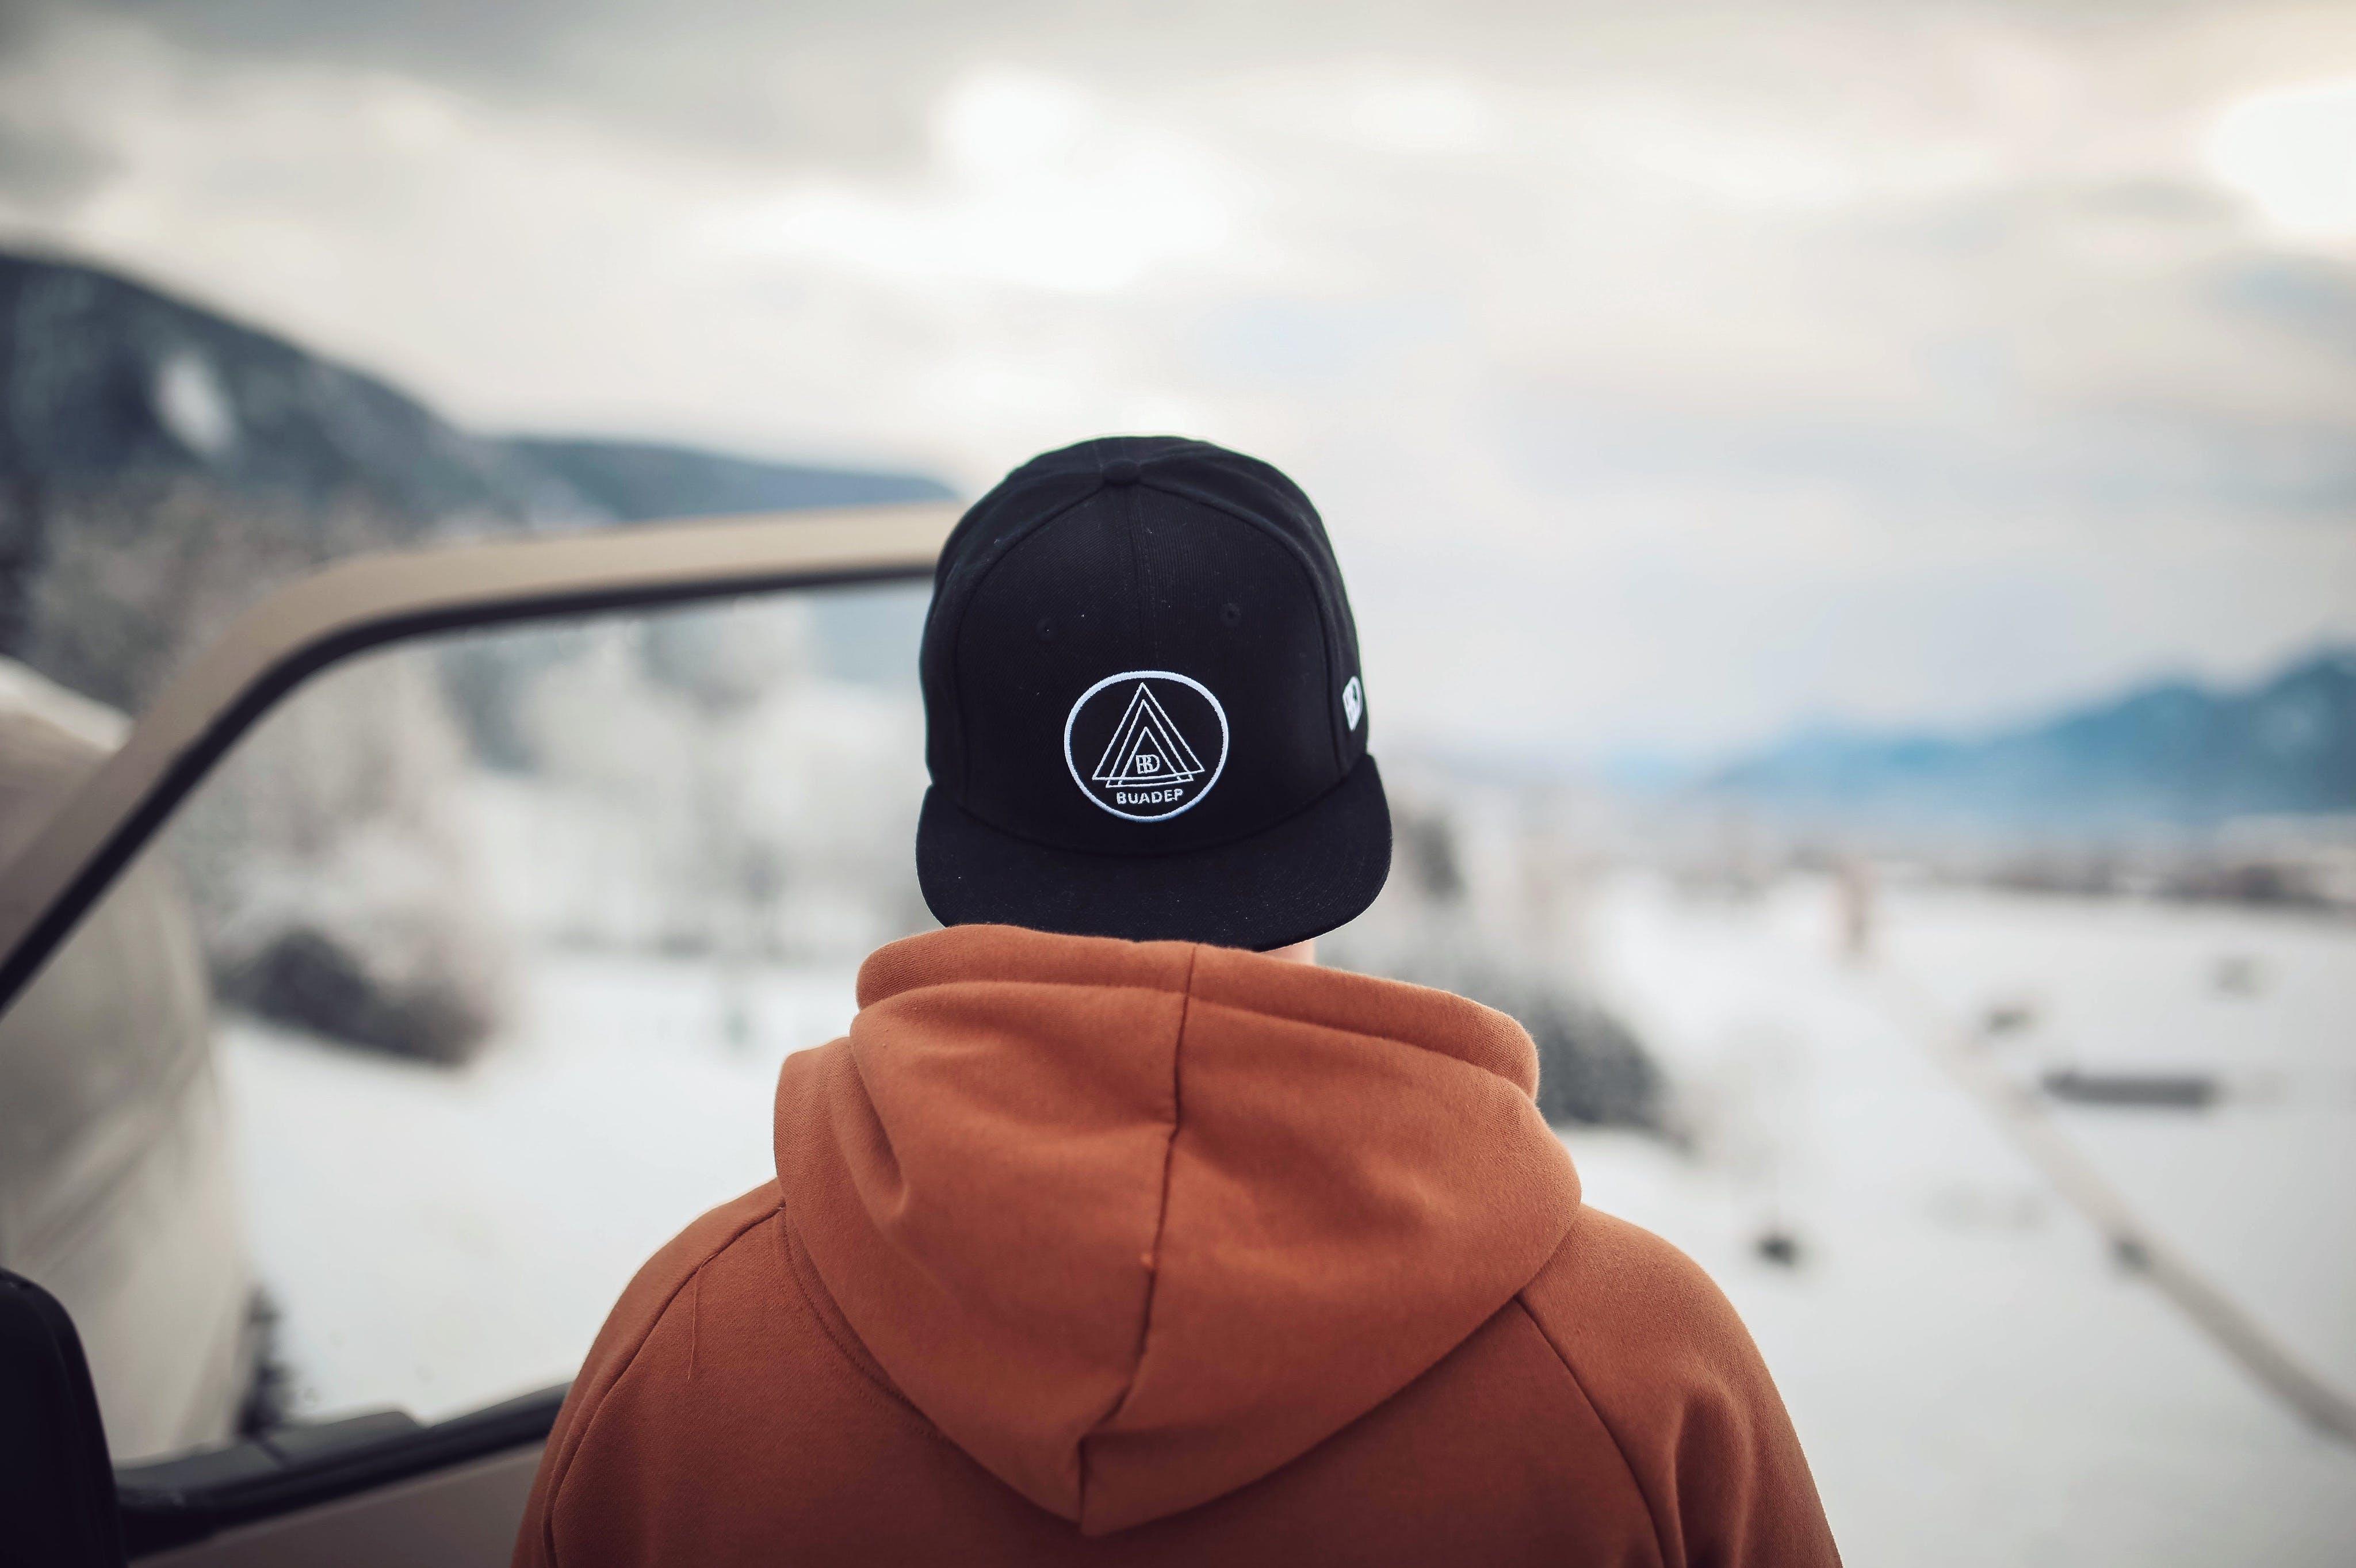 Person Wearing Black Cap and Orange Hoodie Turning His Back